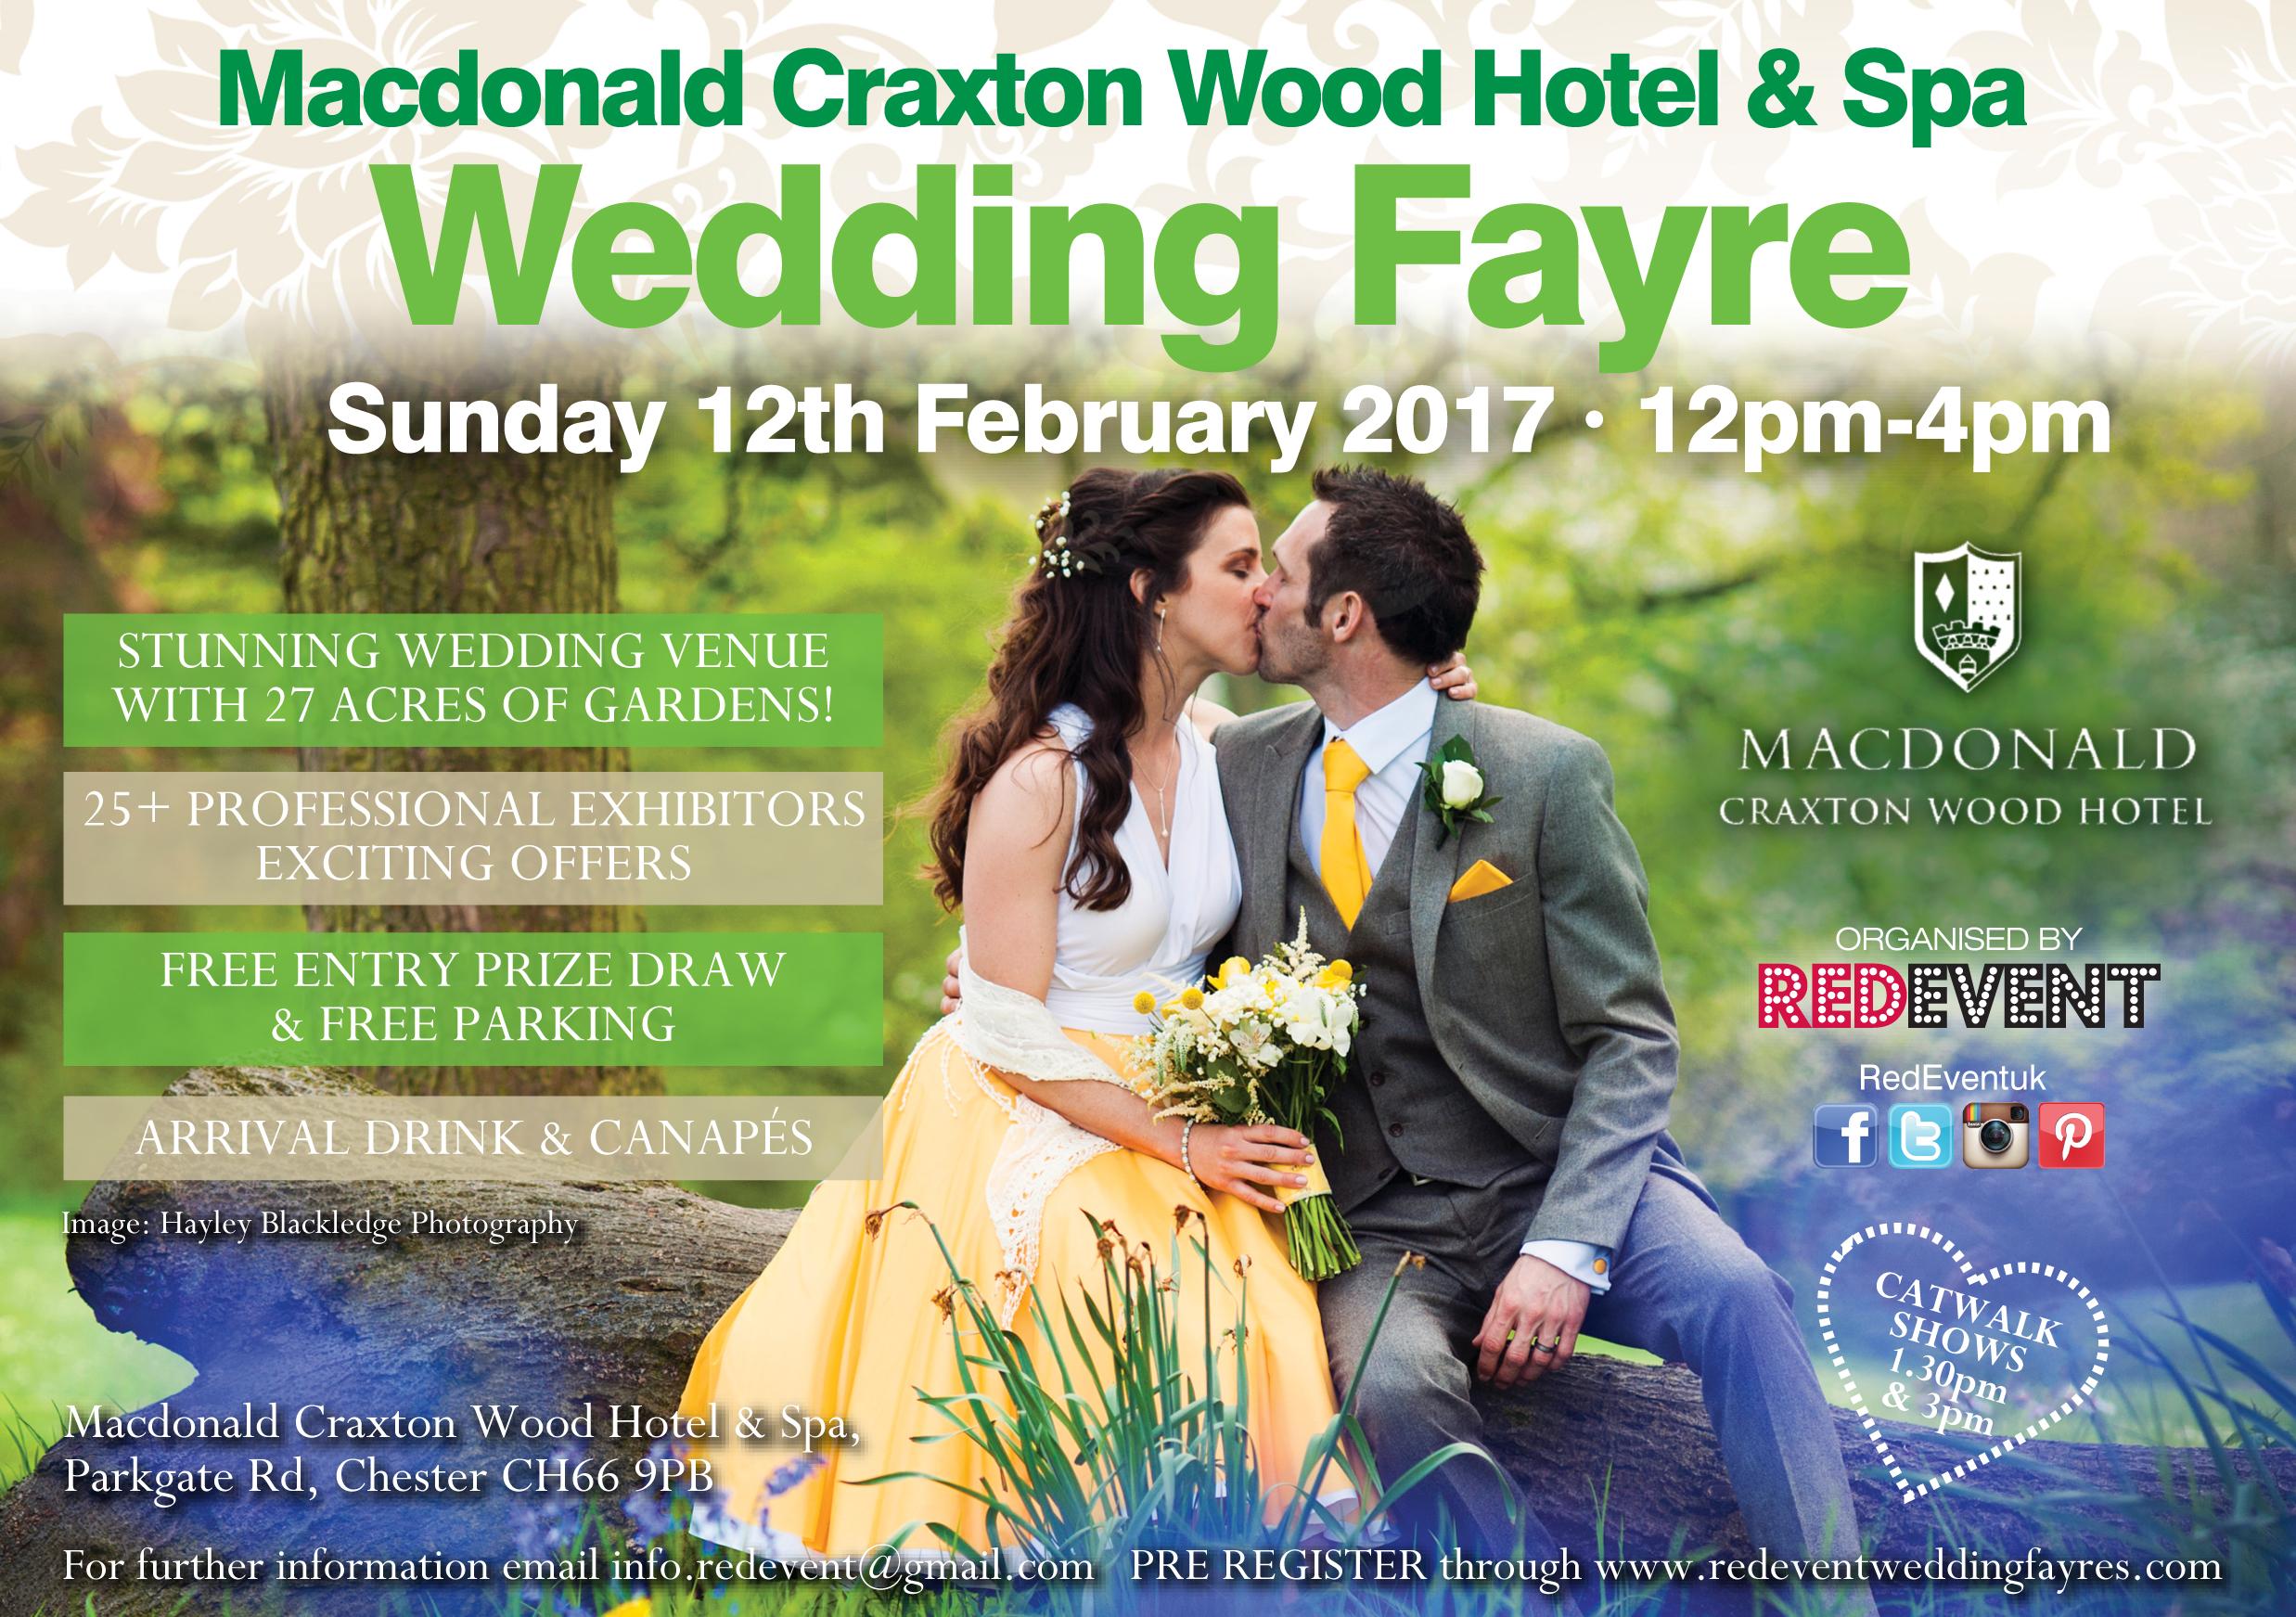 Macdonald Craxton Wood Red Event Wedding Fayre www.redeventweddingfayres.com